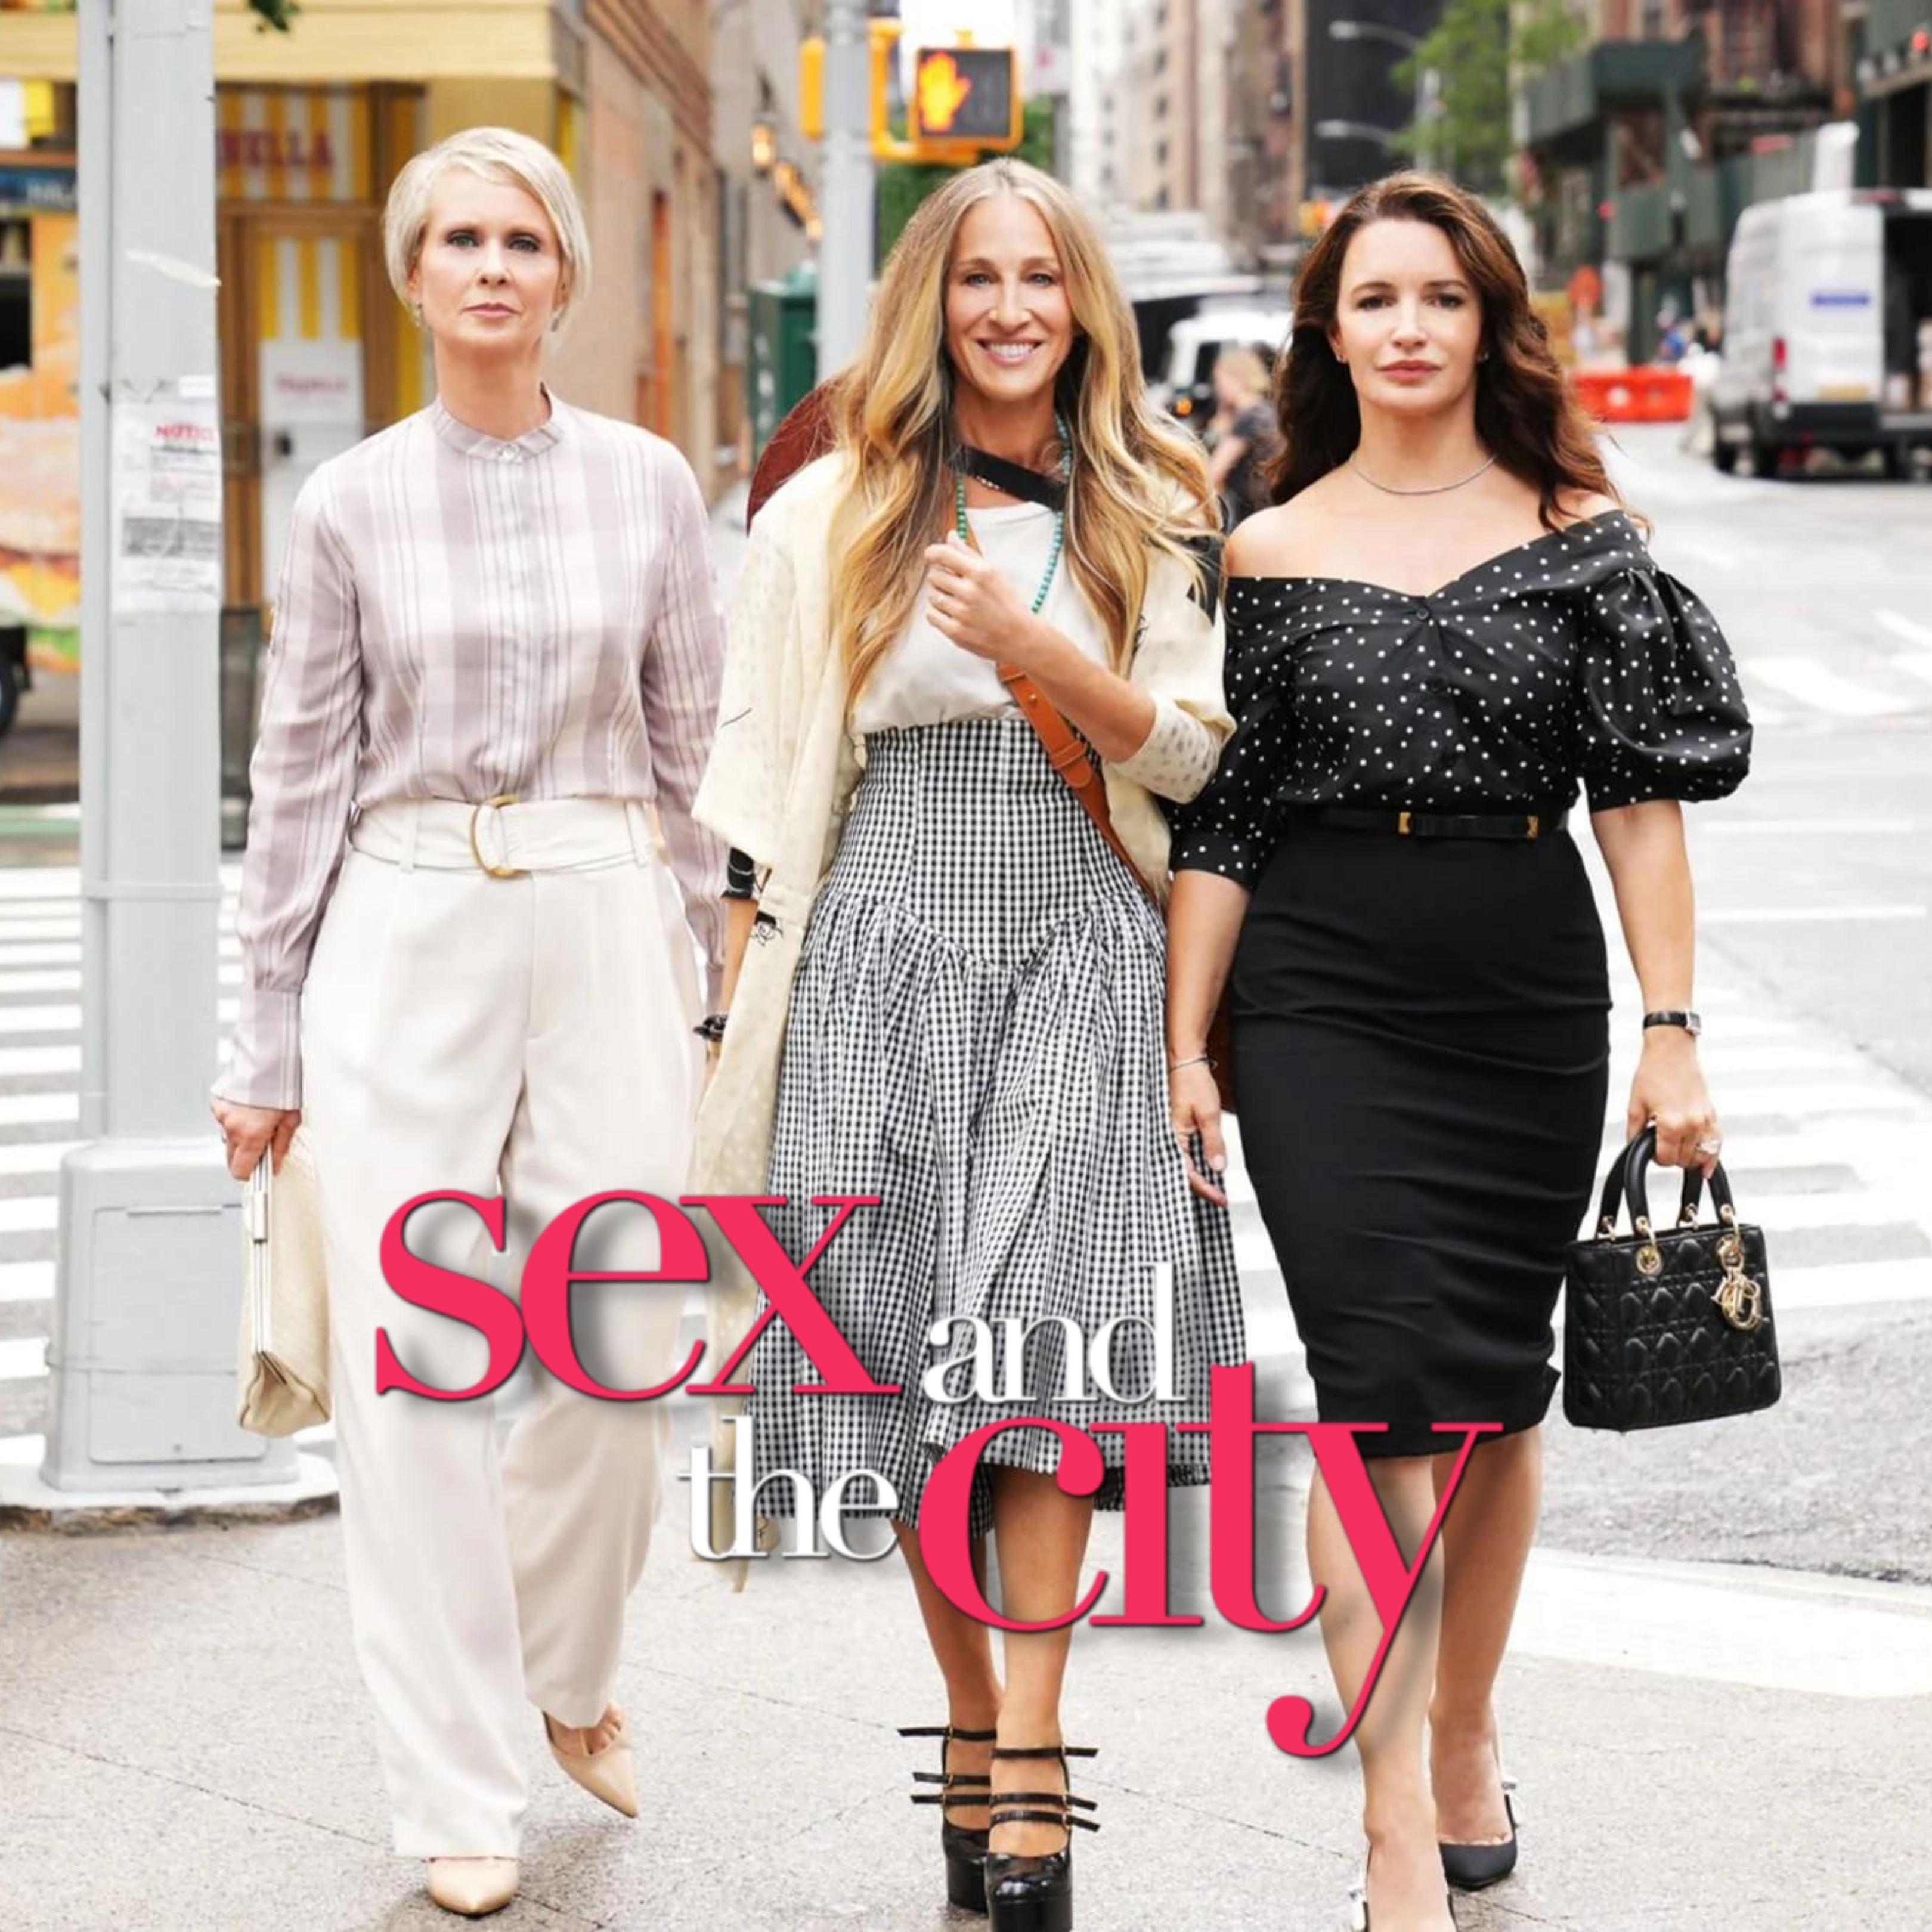 Nova fase: Sex and the City